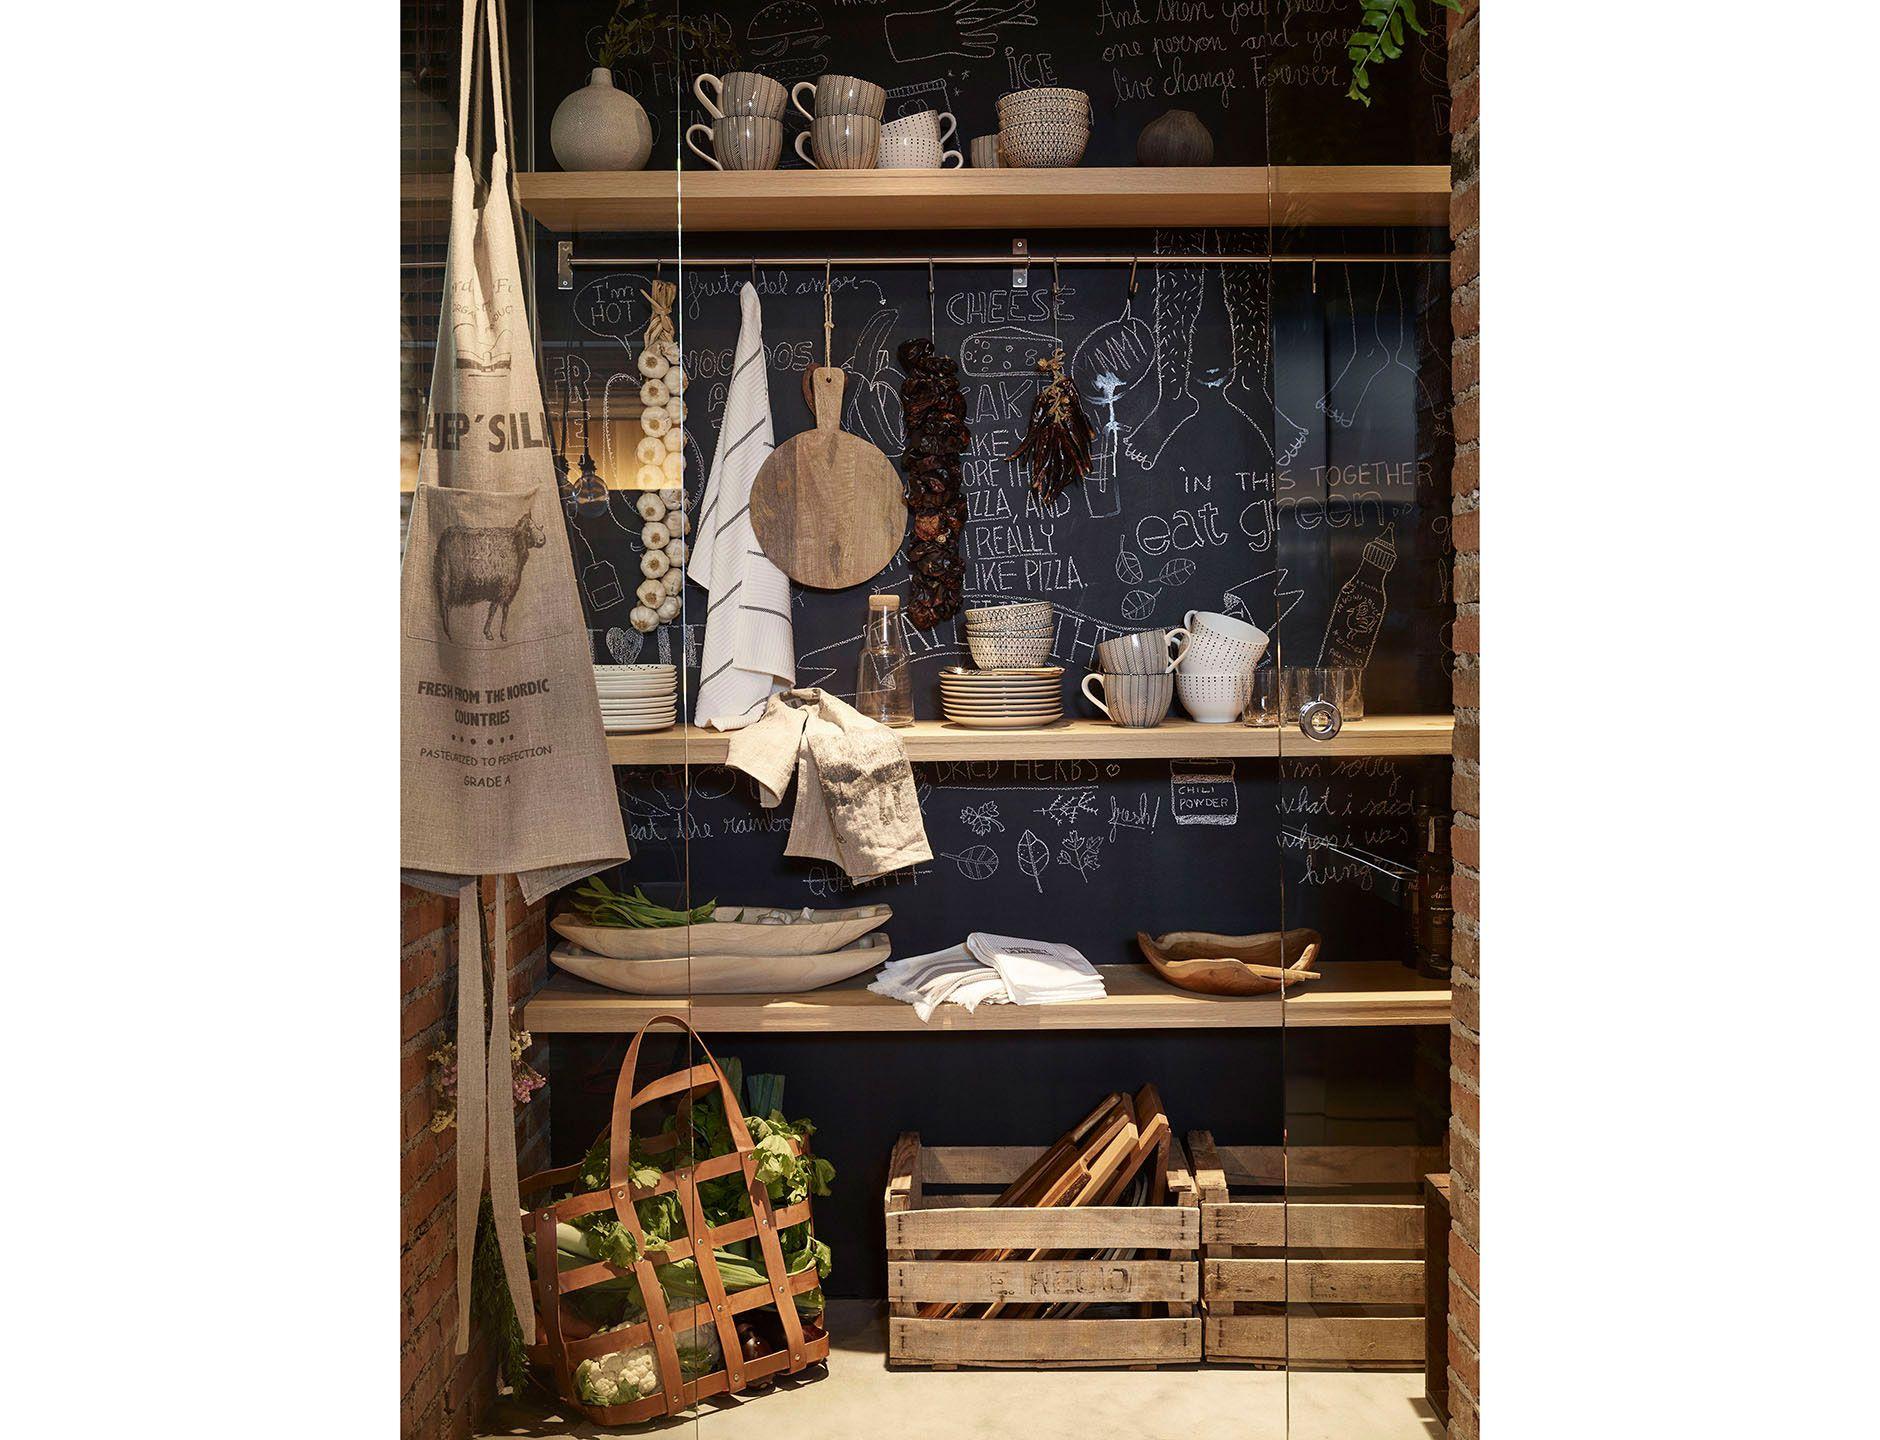 lookbook kitchen pinterest loft zara y muebles de. Black Bedroom Furniture Sets. Home Design Ideas